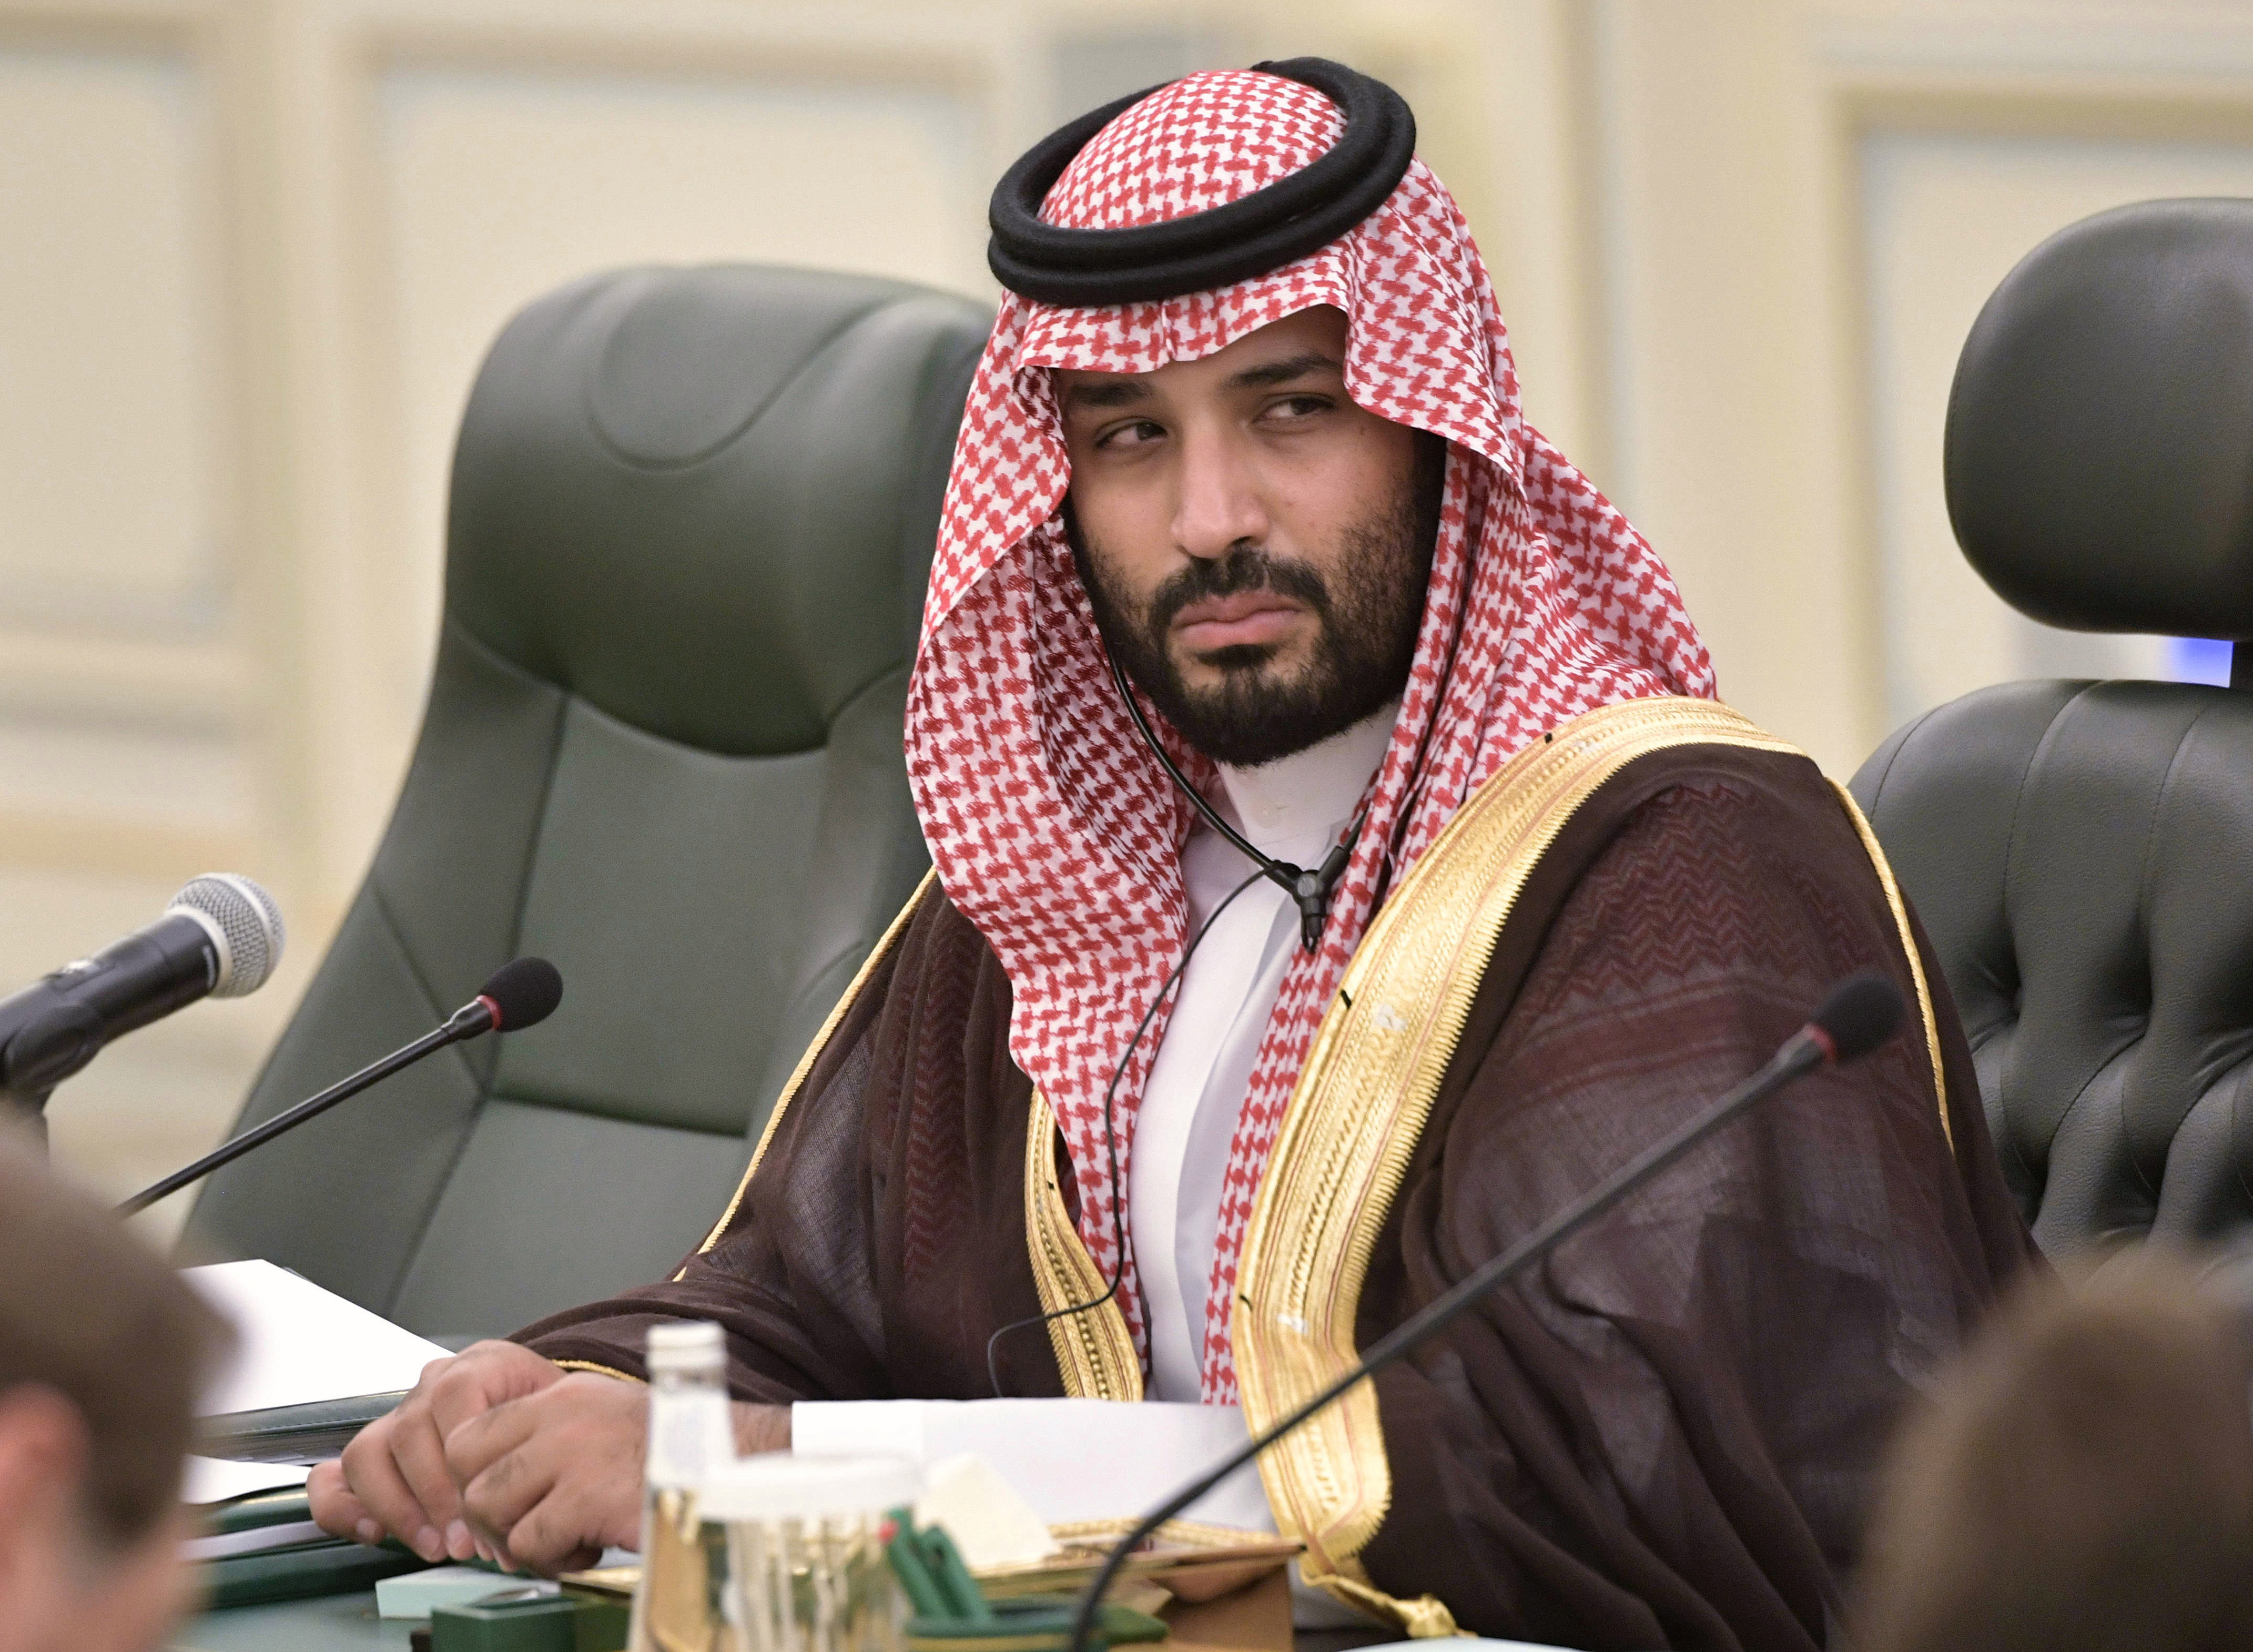 Saudi Arabia has denied that Mohammed Bin Salman was behind the WhatsApp hack